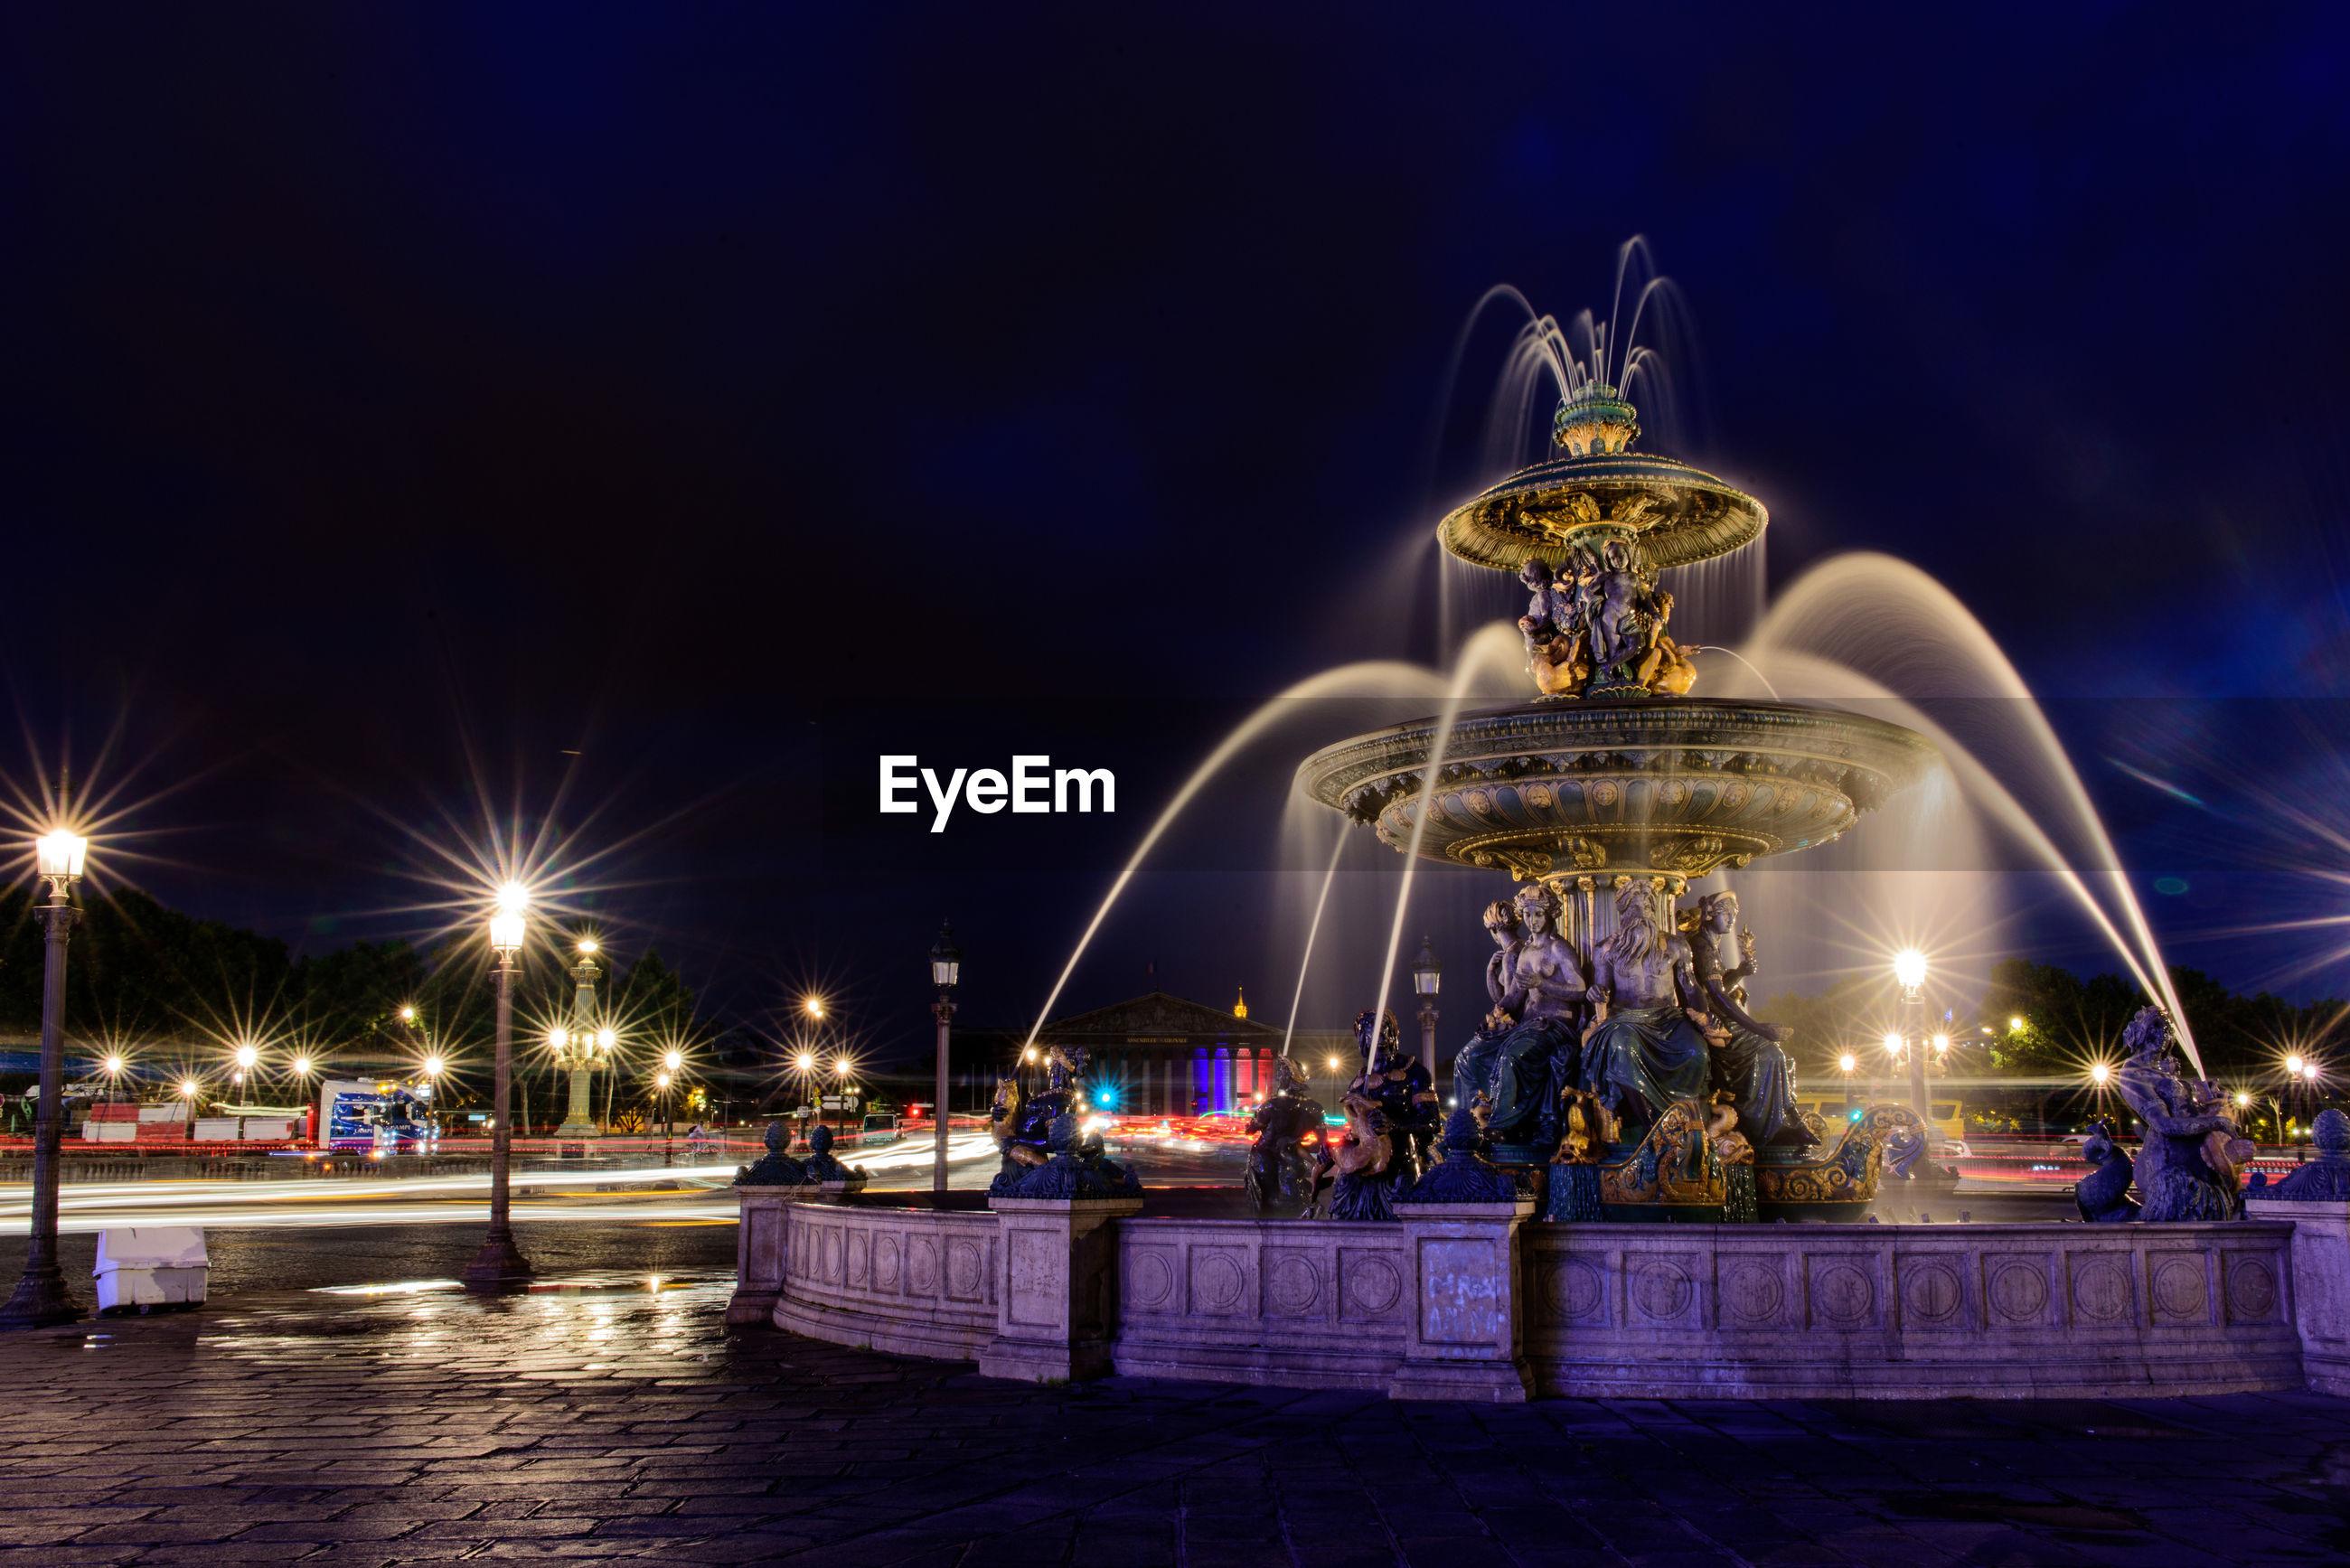 Illuminated fountain against blue sky at night